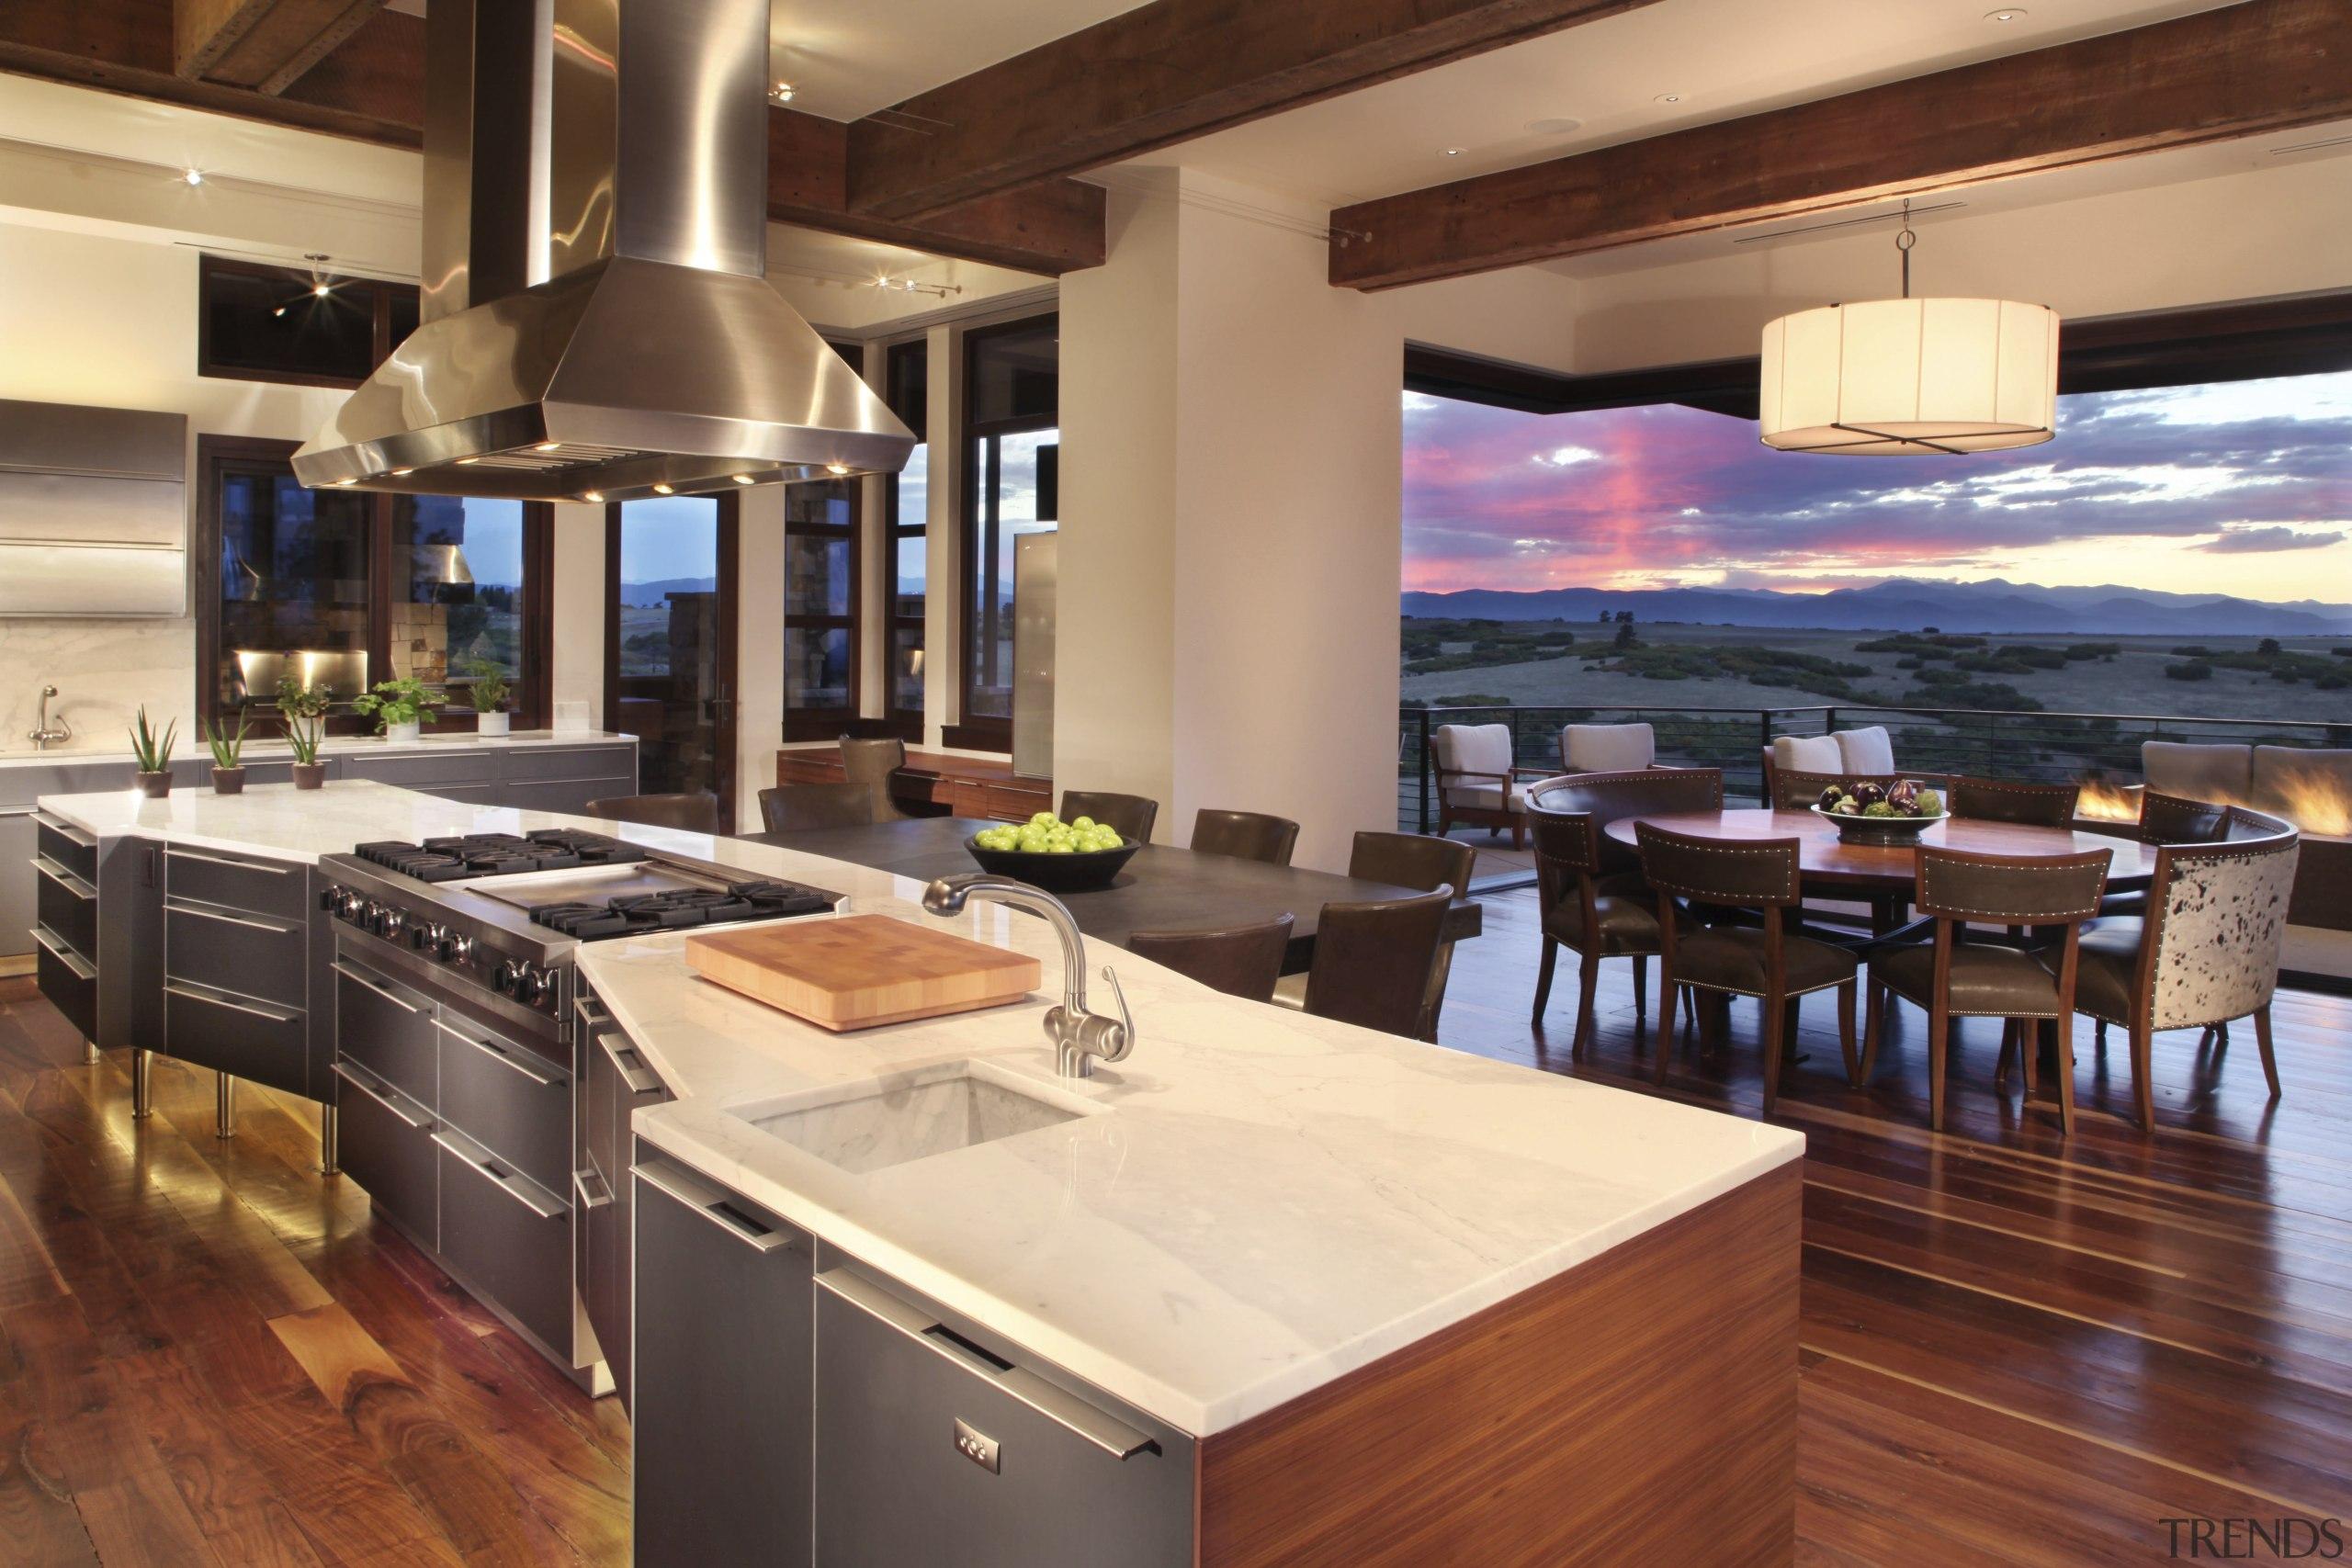 This kitchen was designed and manufactured by Bulthaup. countertop, interior design, kitchen, orange